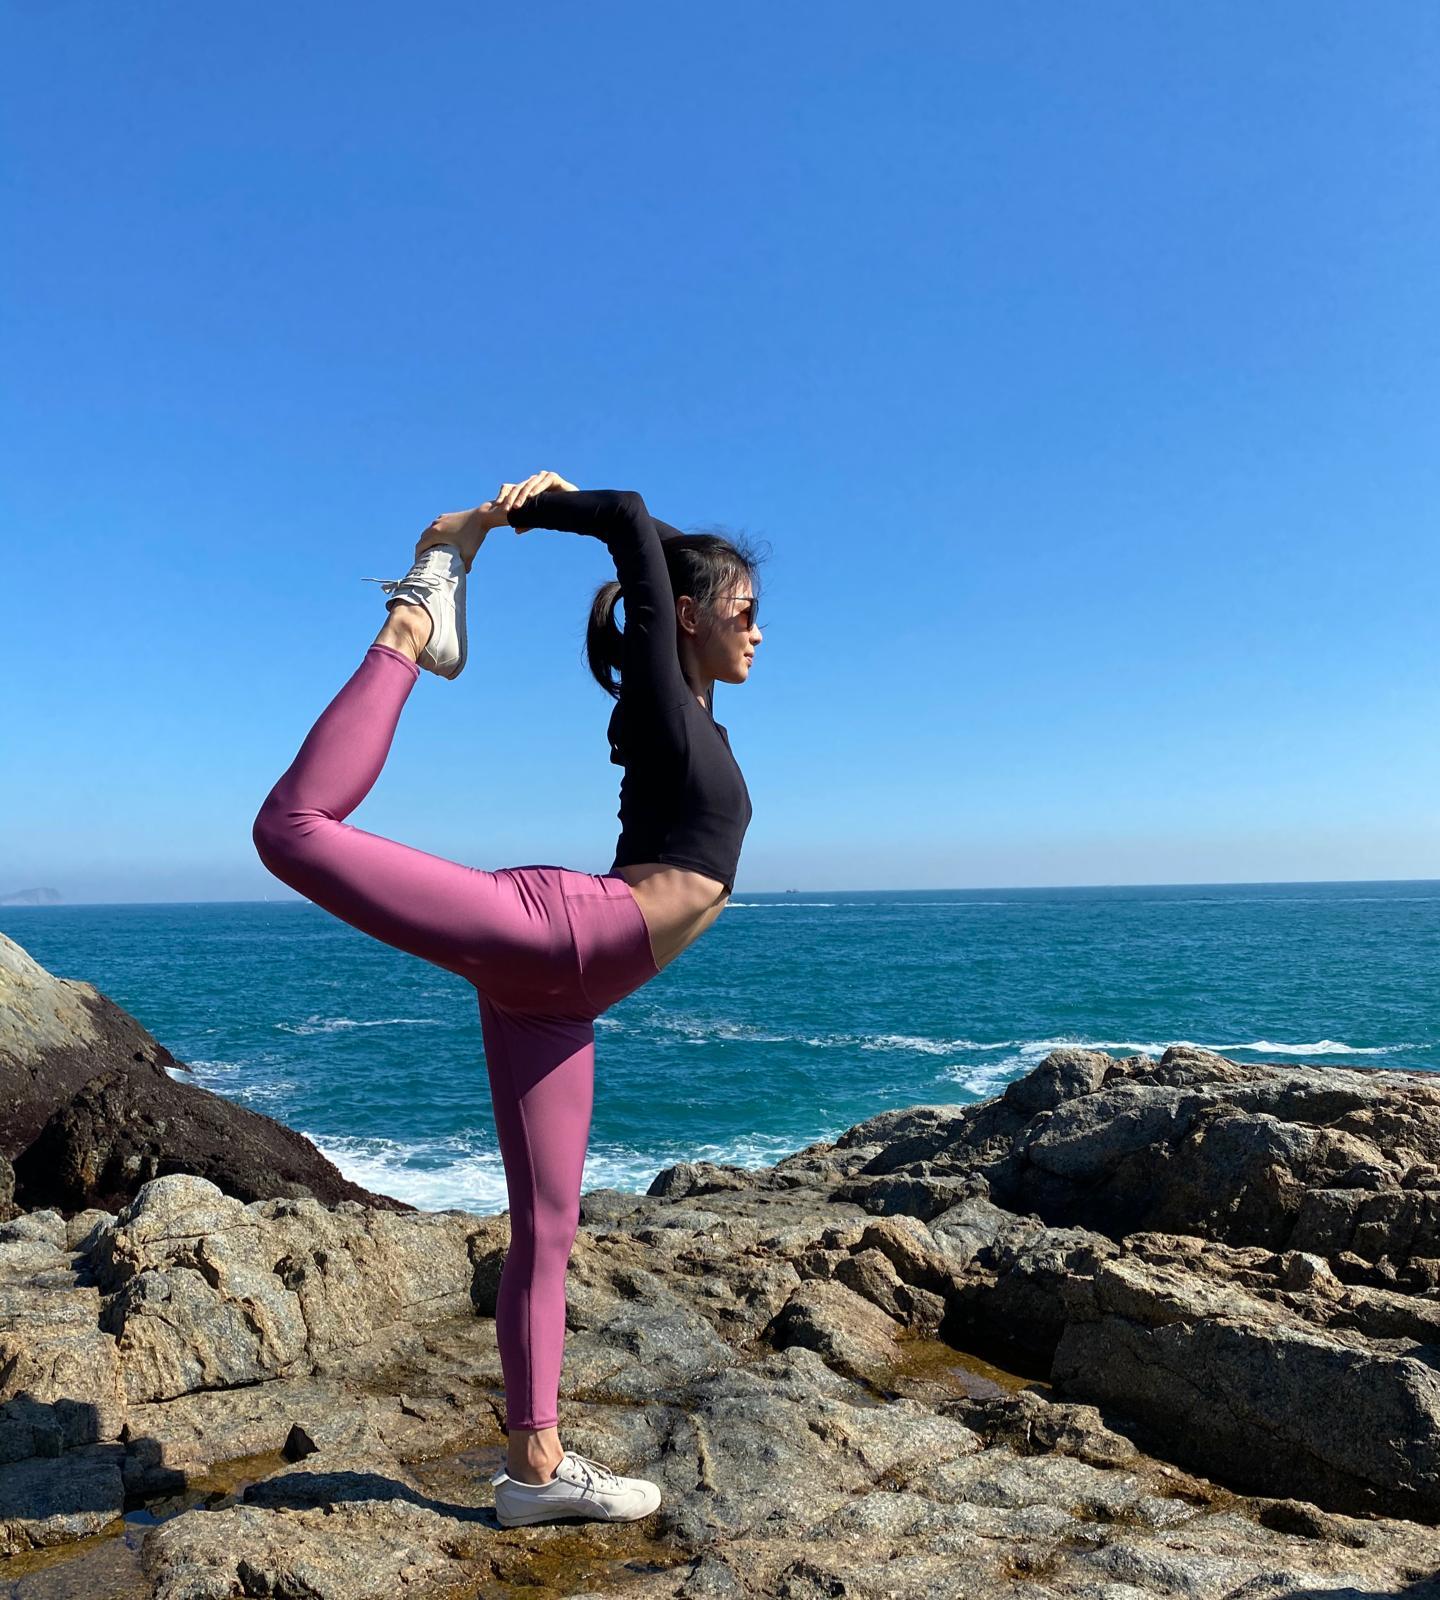 Denise會到不同地方取景,拍攝瑜伽教學影片。(受訪者提供)